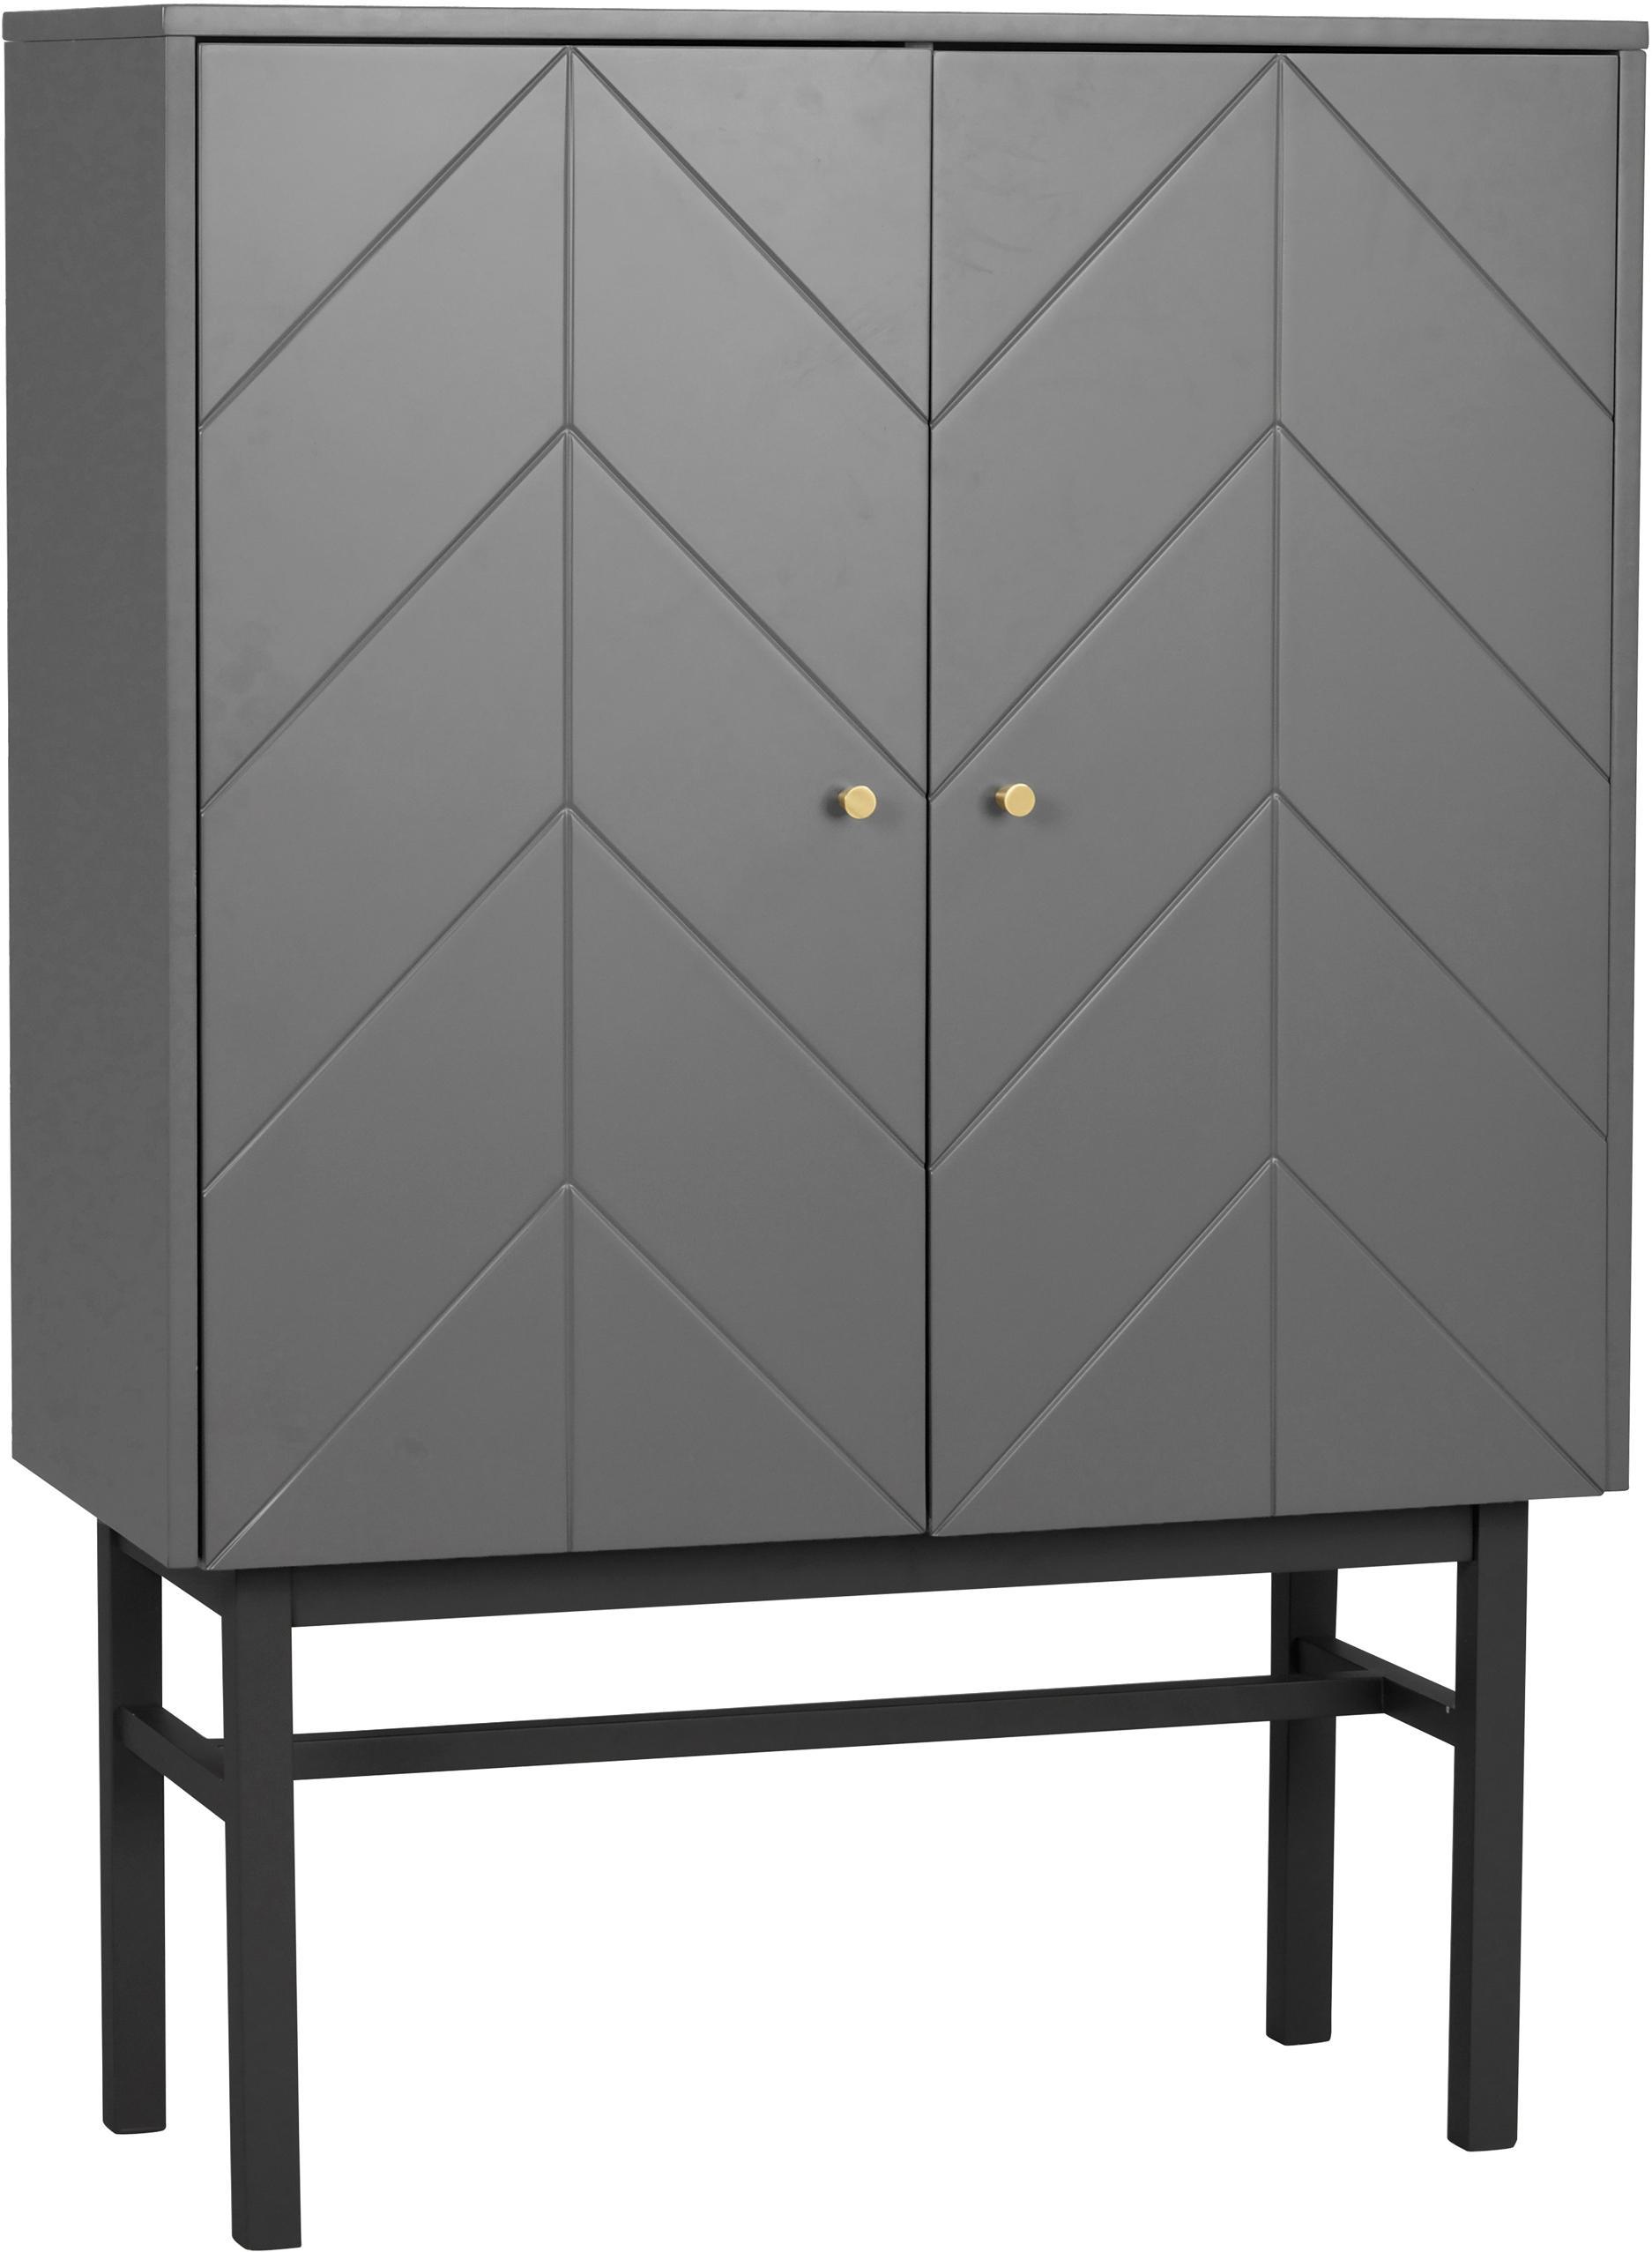 Chiffonnier Webster, Estructura: tablero de fibras de dens, Patas: madera de caucho maciza, Gris antracita, An 94 x Al 135 cm